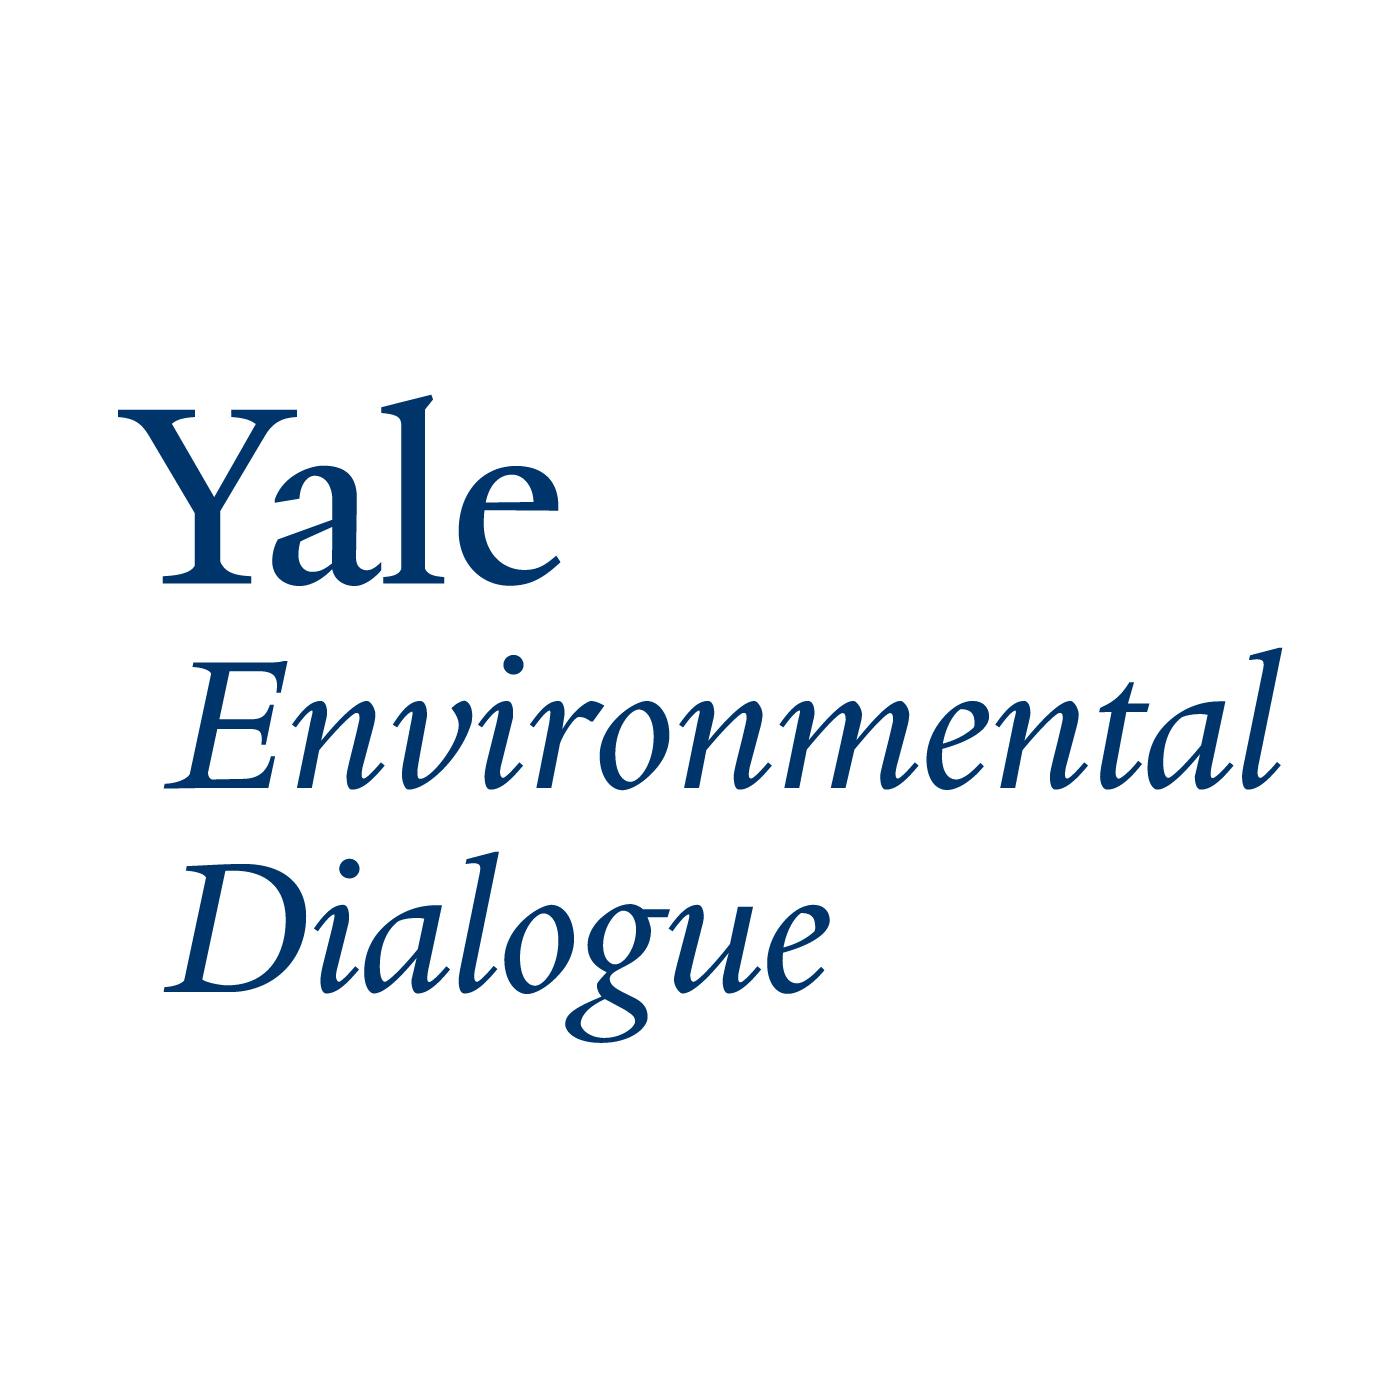 Yale Environmental Dialogue